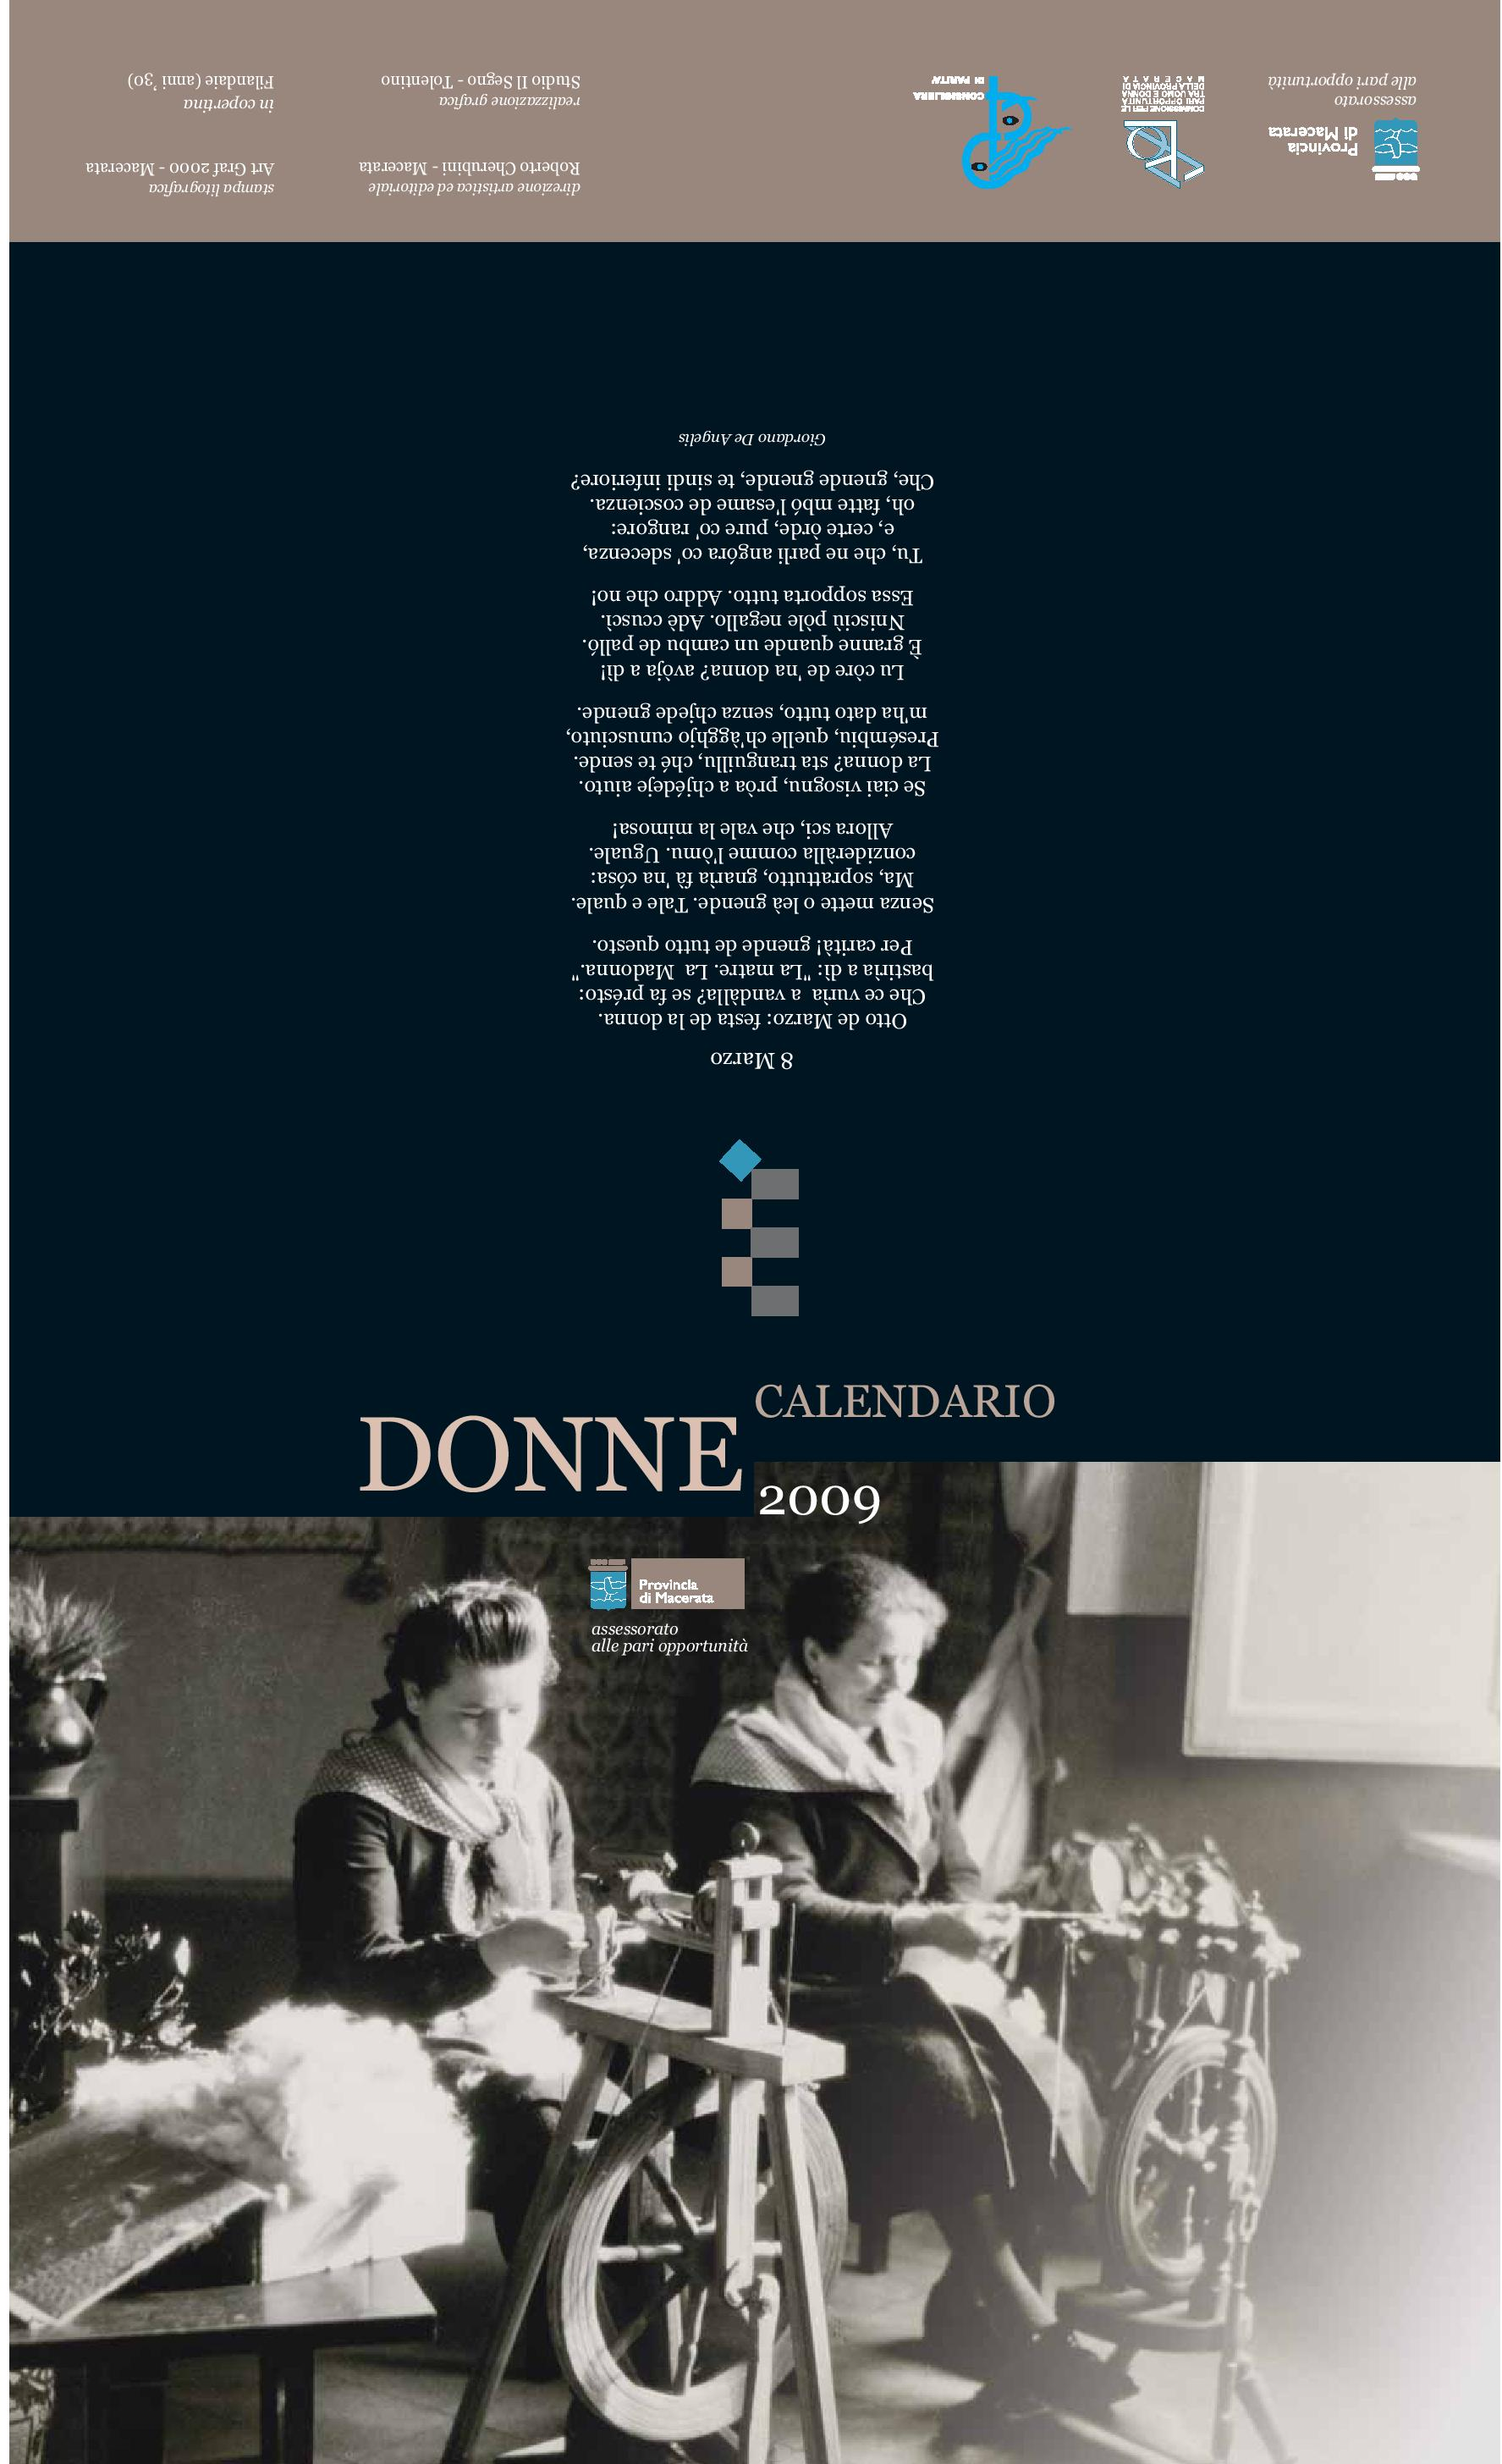 calendario_donne-page-001